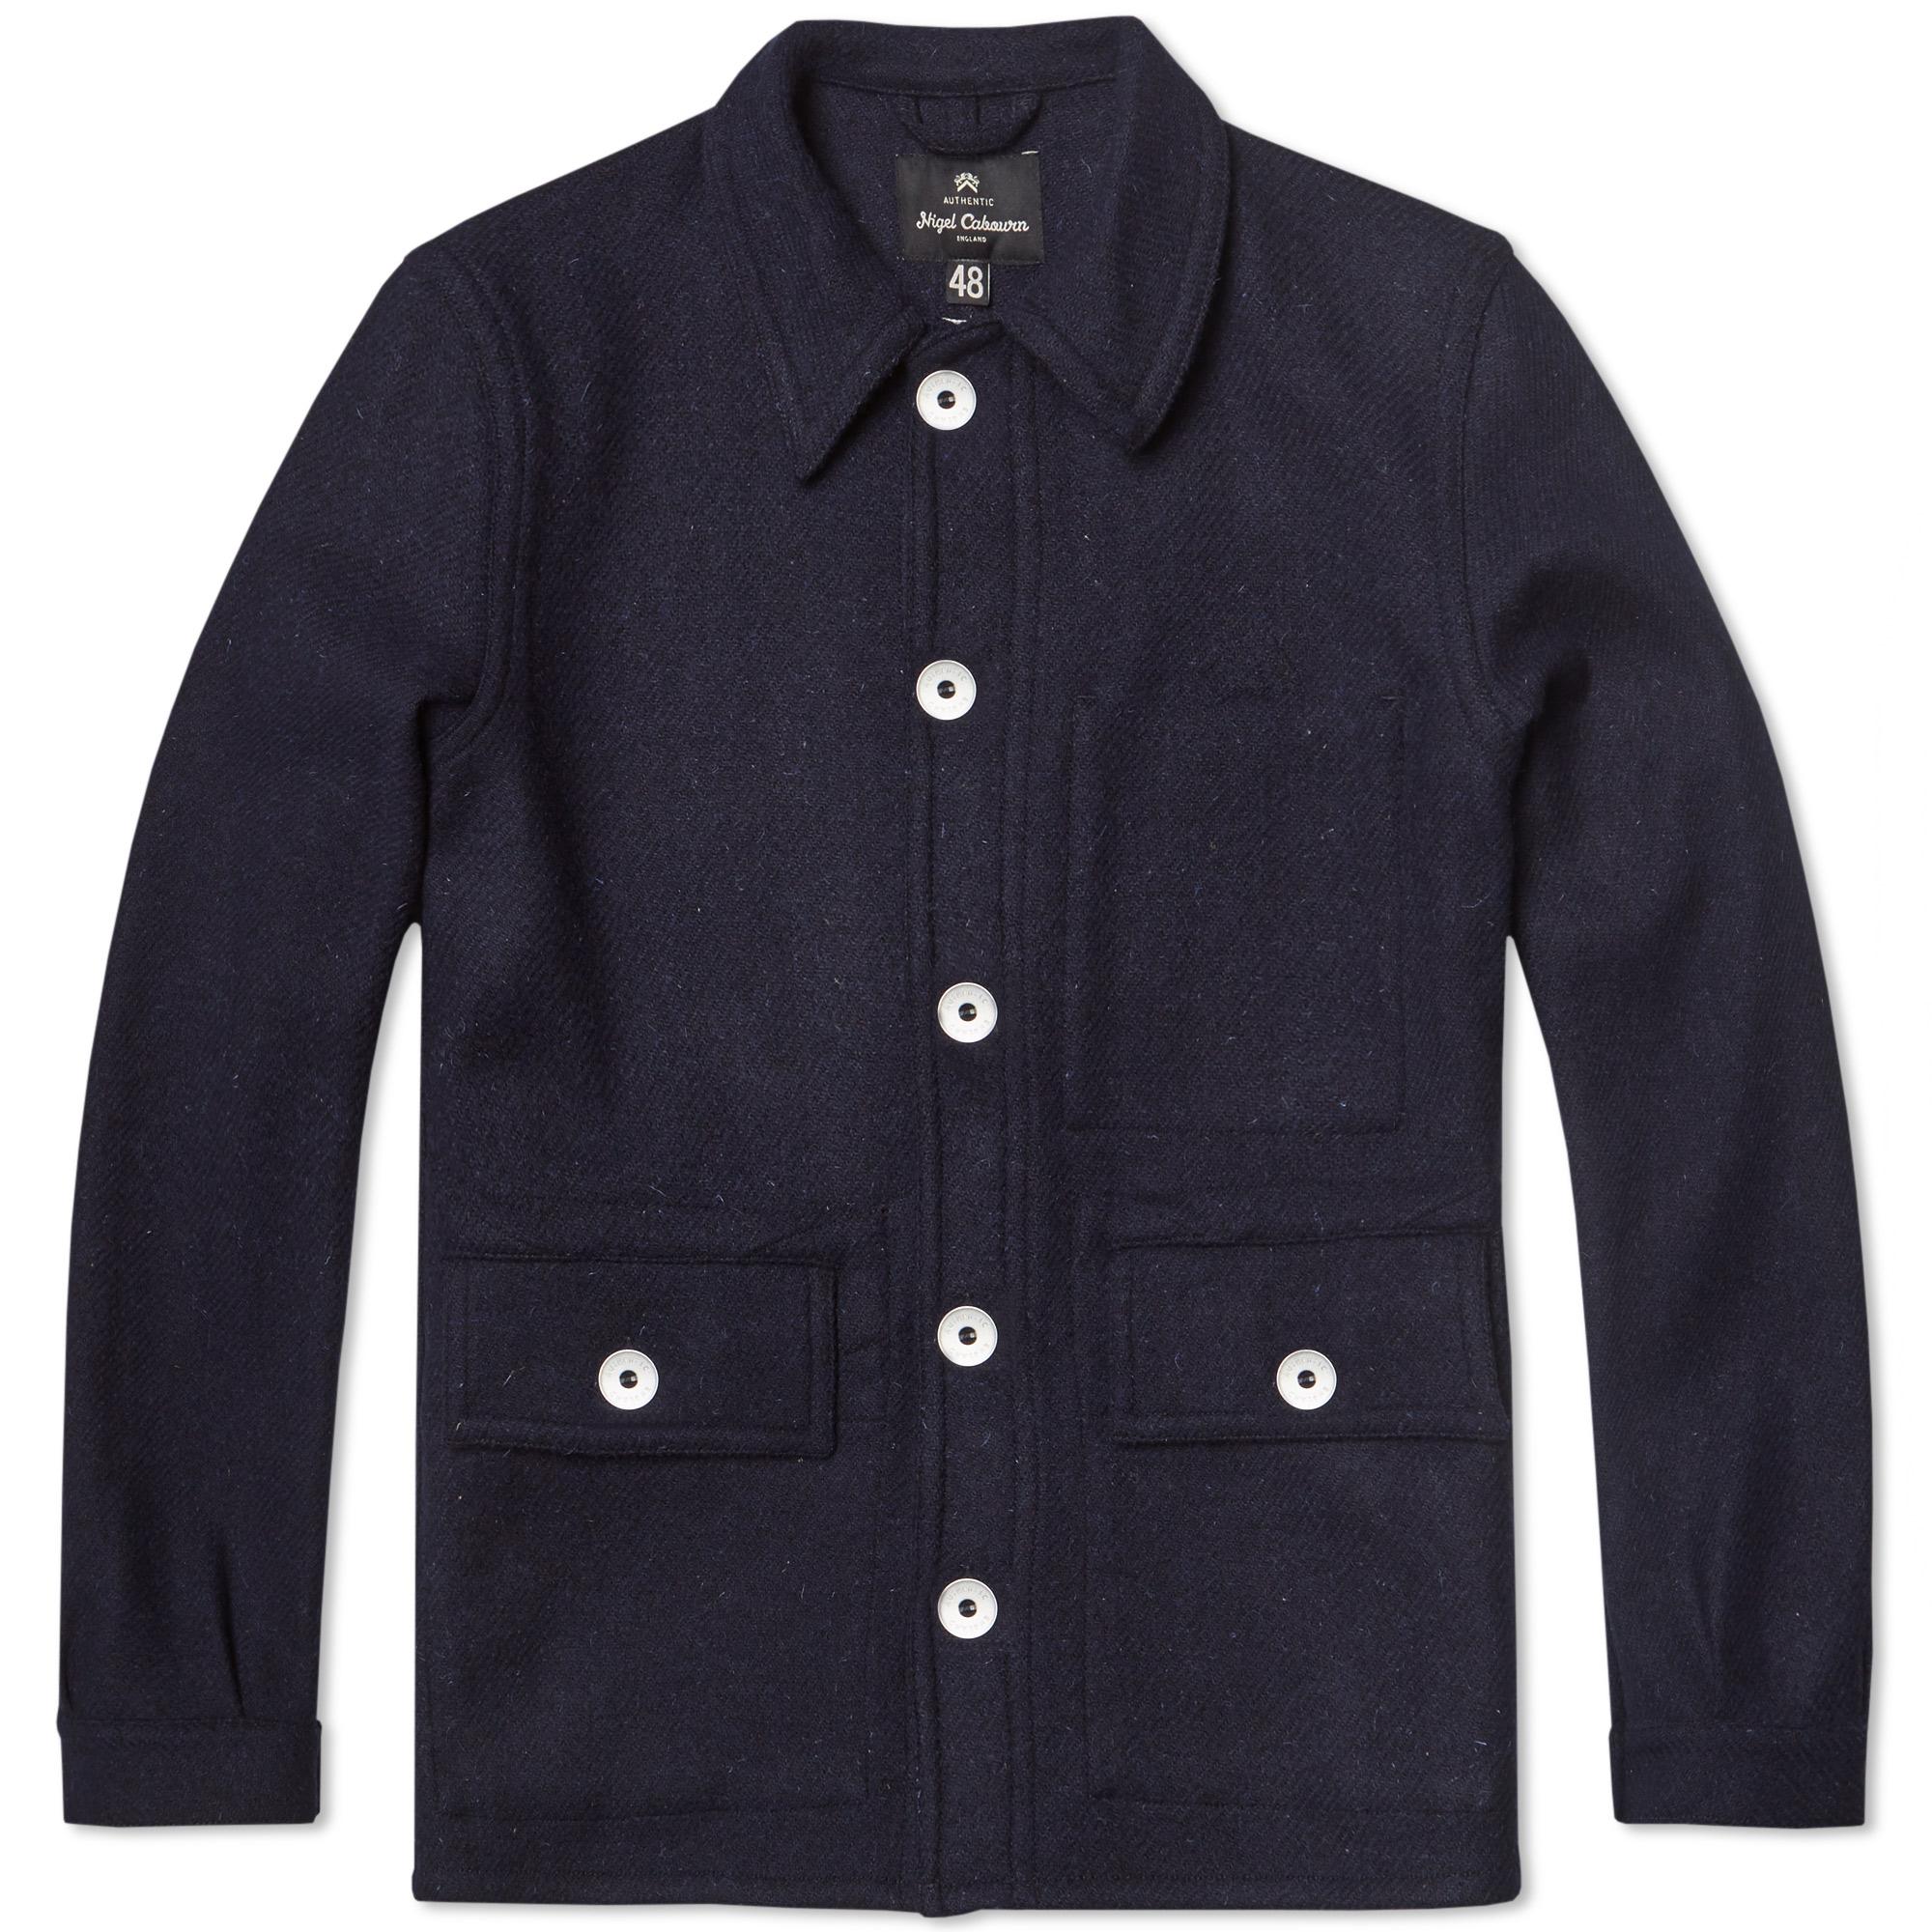 Nigel Cabourn x Lybro Short Work Jacket (Dark Navy Harris Tweed)